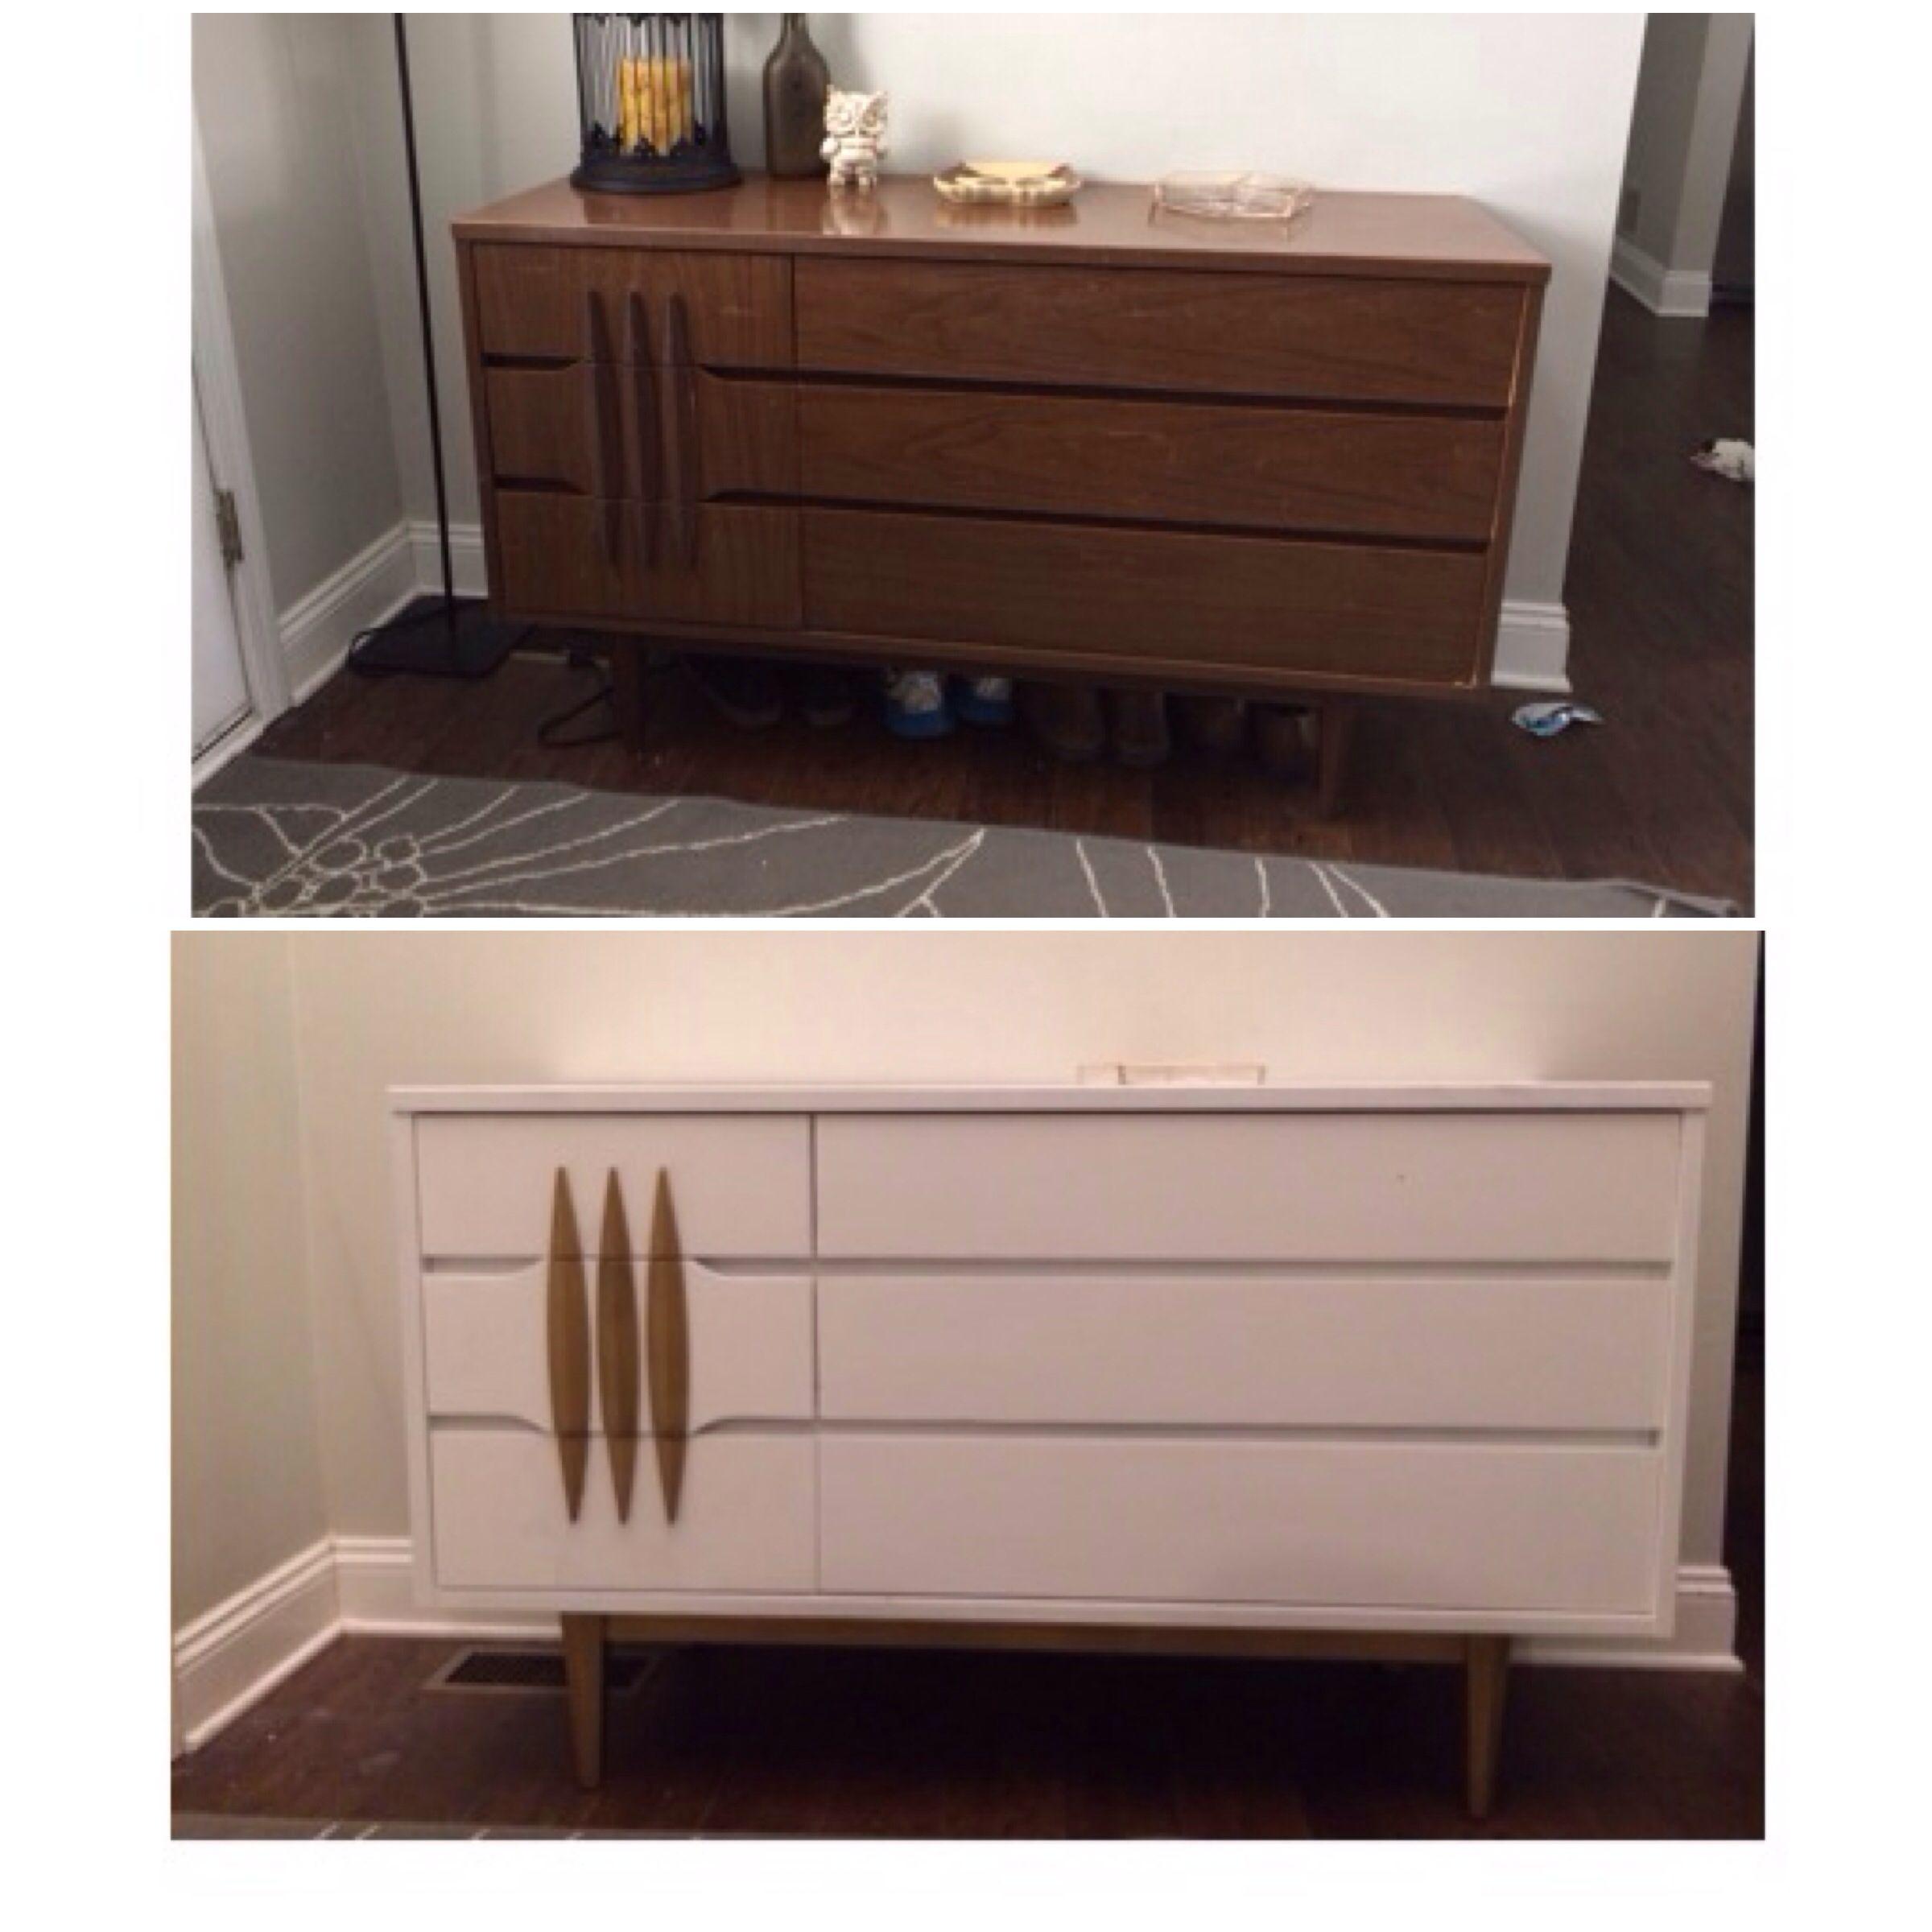 Kroehler Bedroom Furniture Painted Mid Century Modern Dresser Mcm Kroehler Gold For The